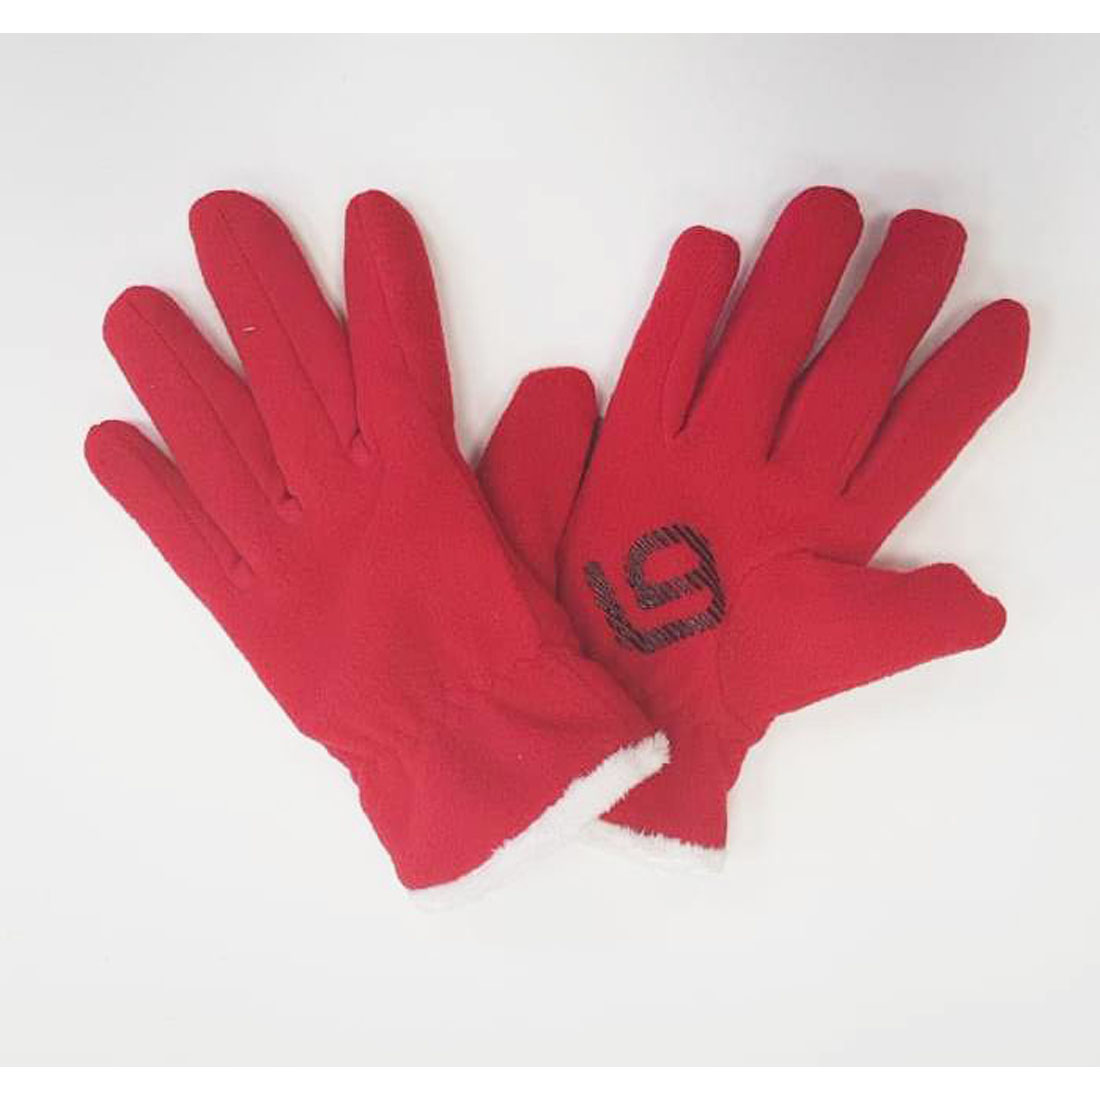 Перчатки KERRY PEPPER K17446 в, размер 6